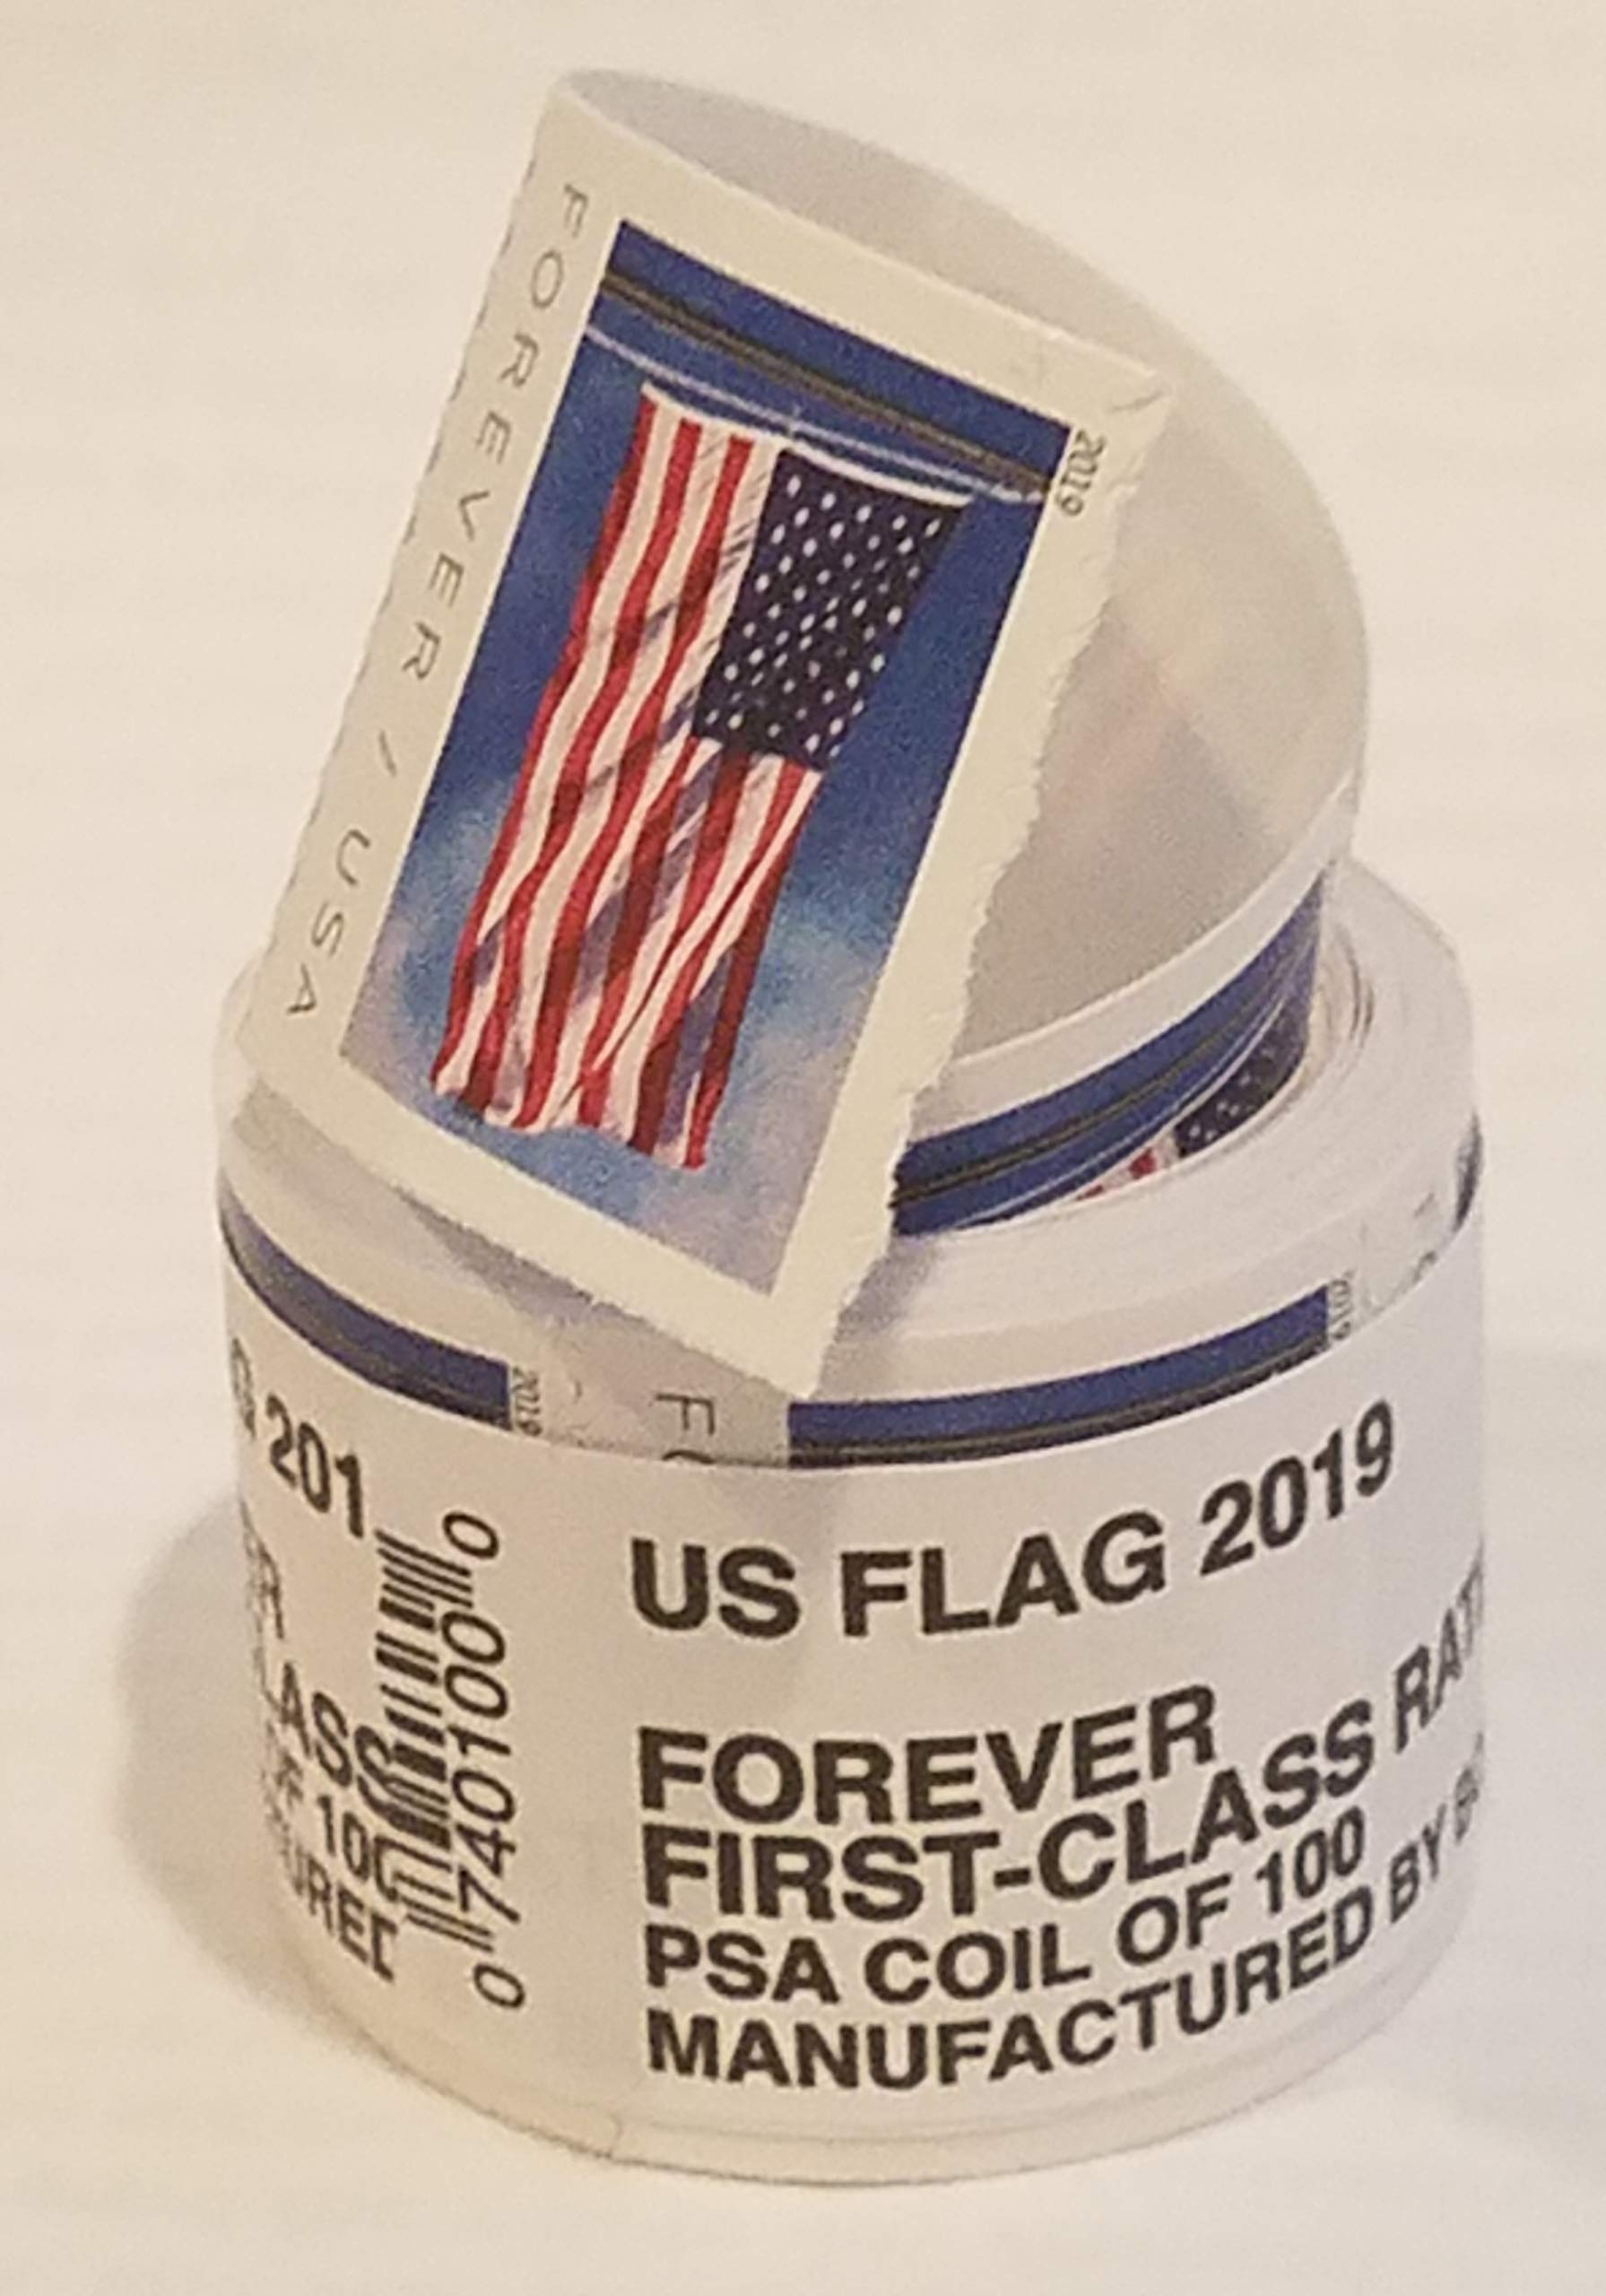 USPS Forever Stamps Roll of 100 - 2019 Flag Version